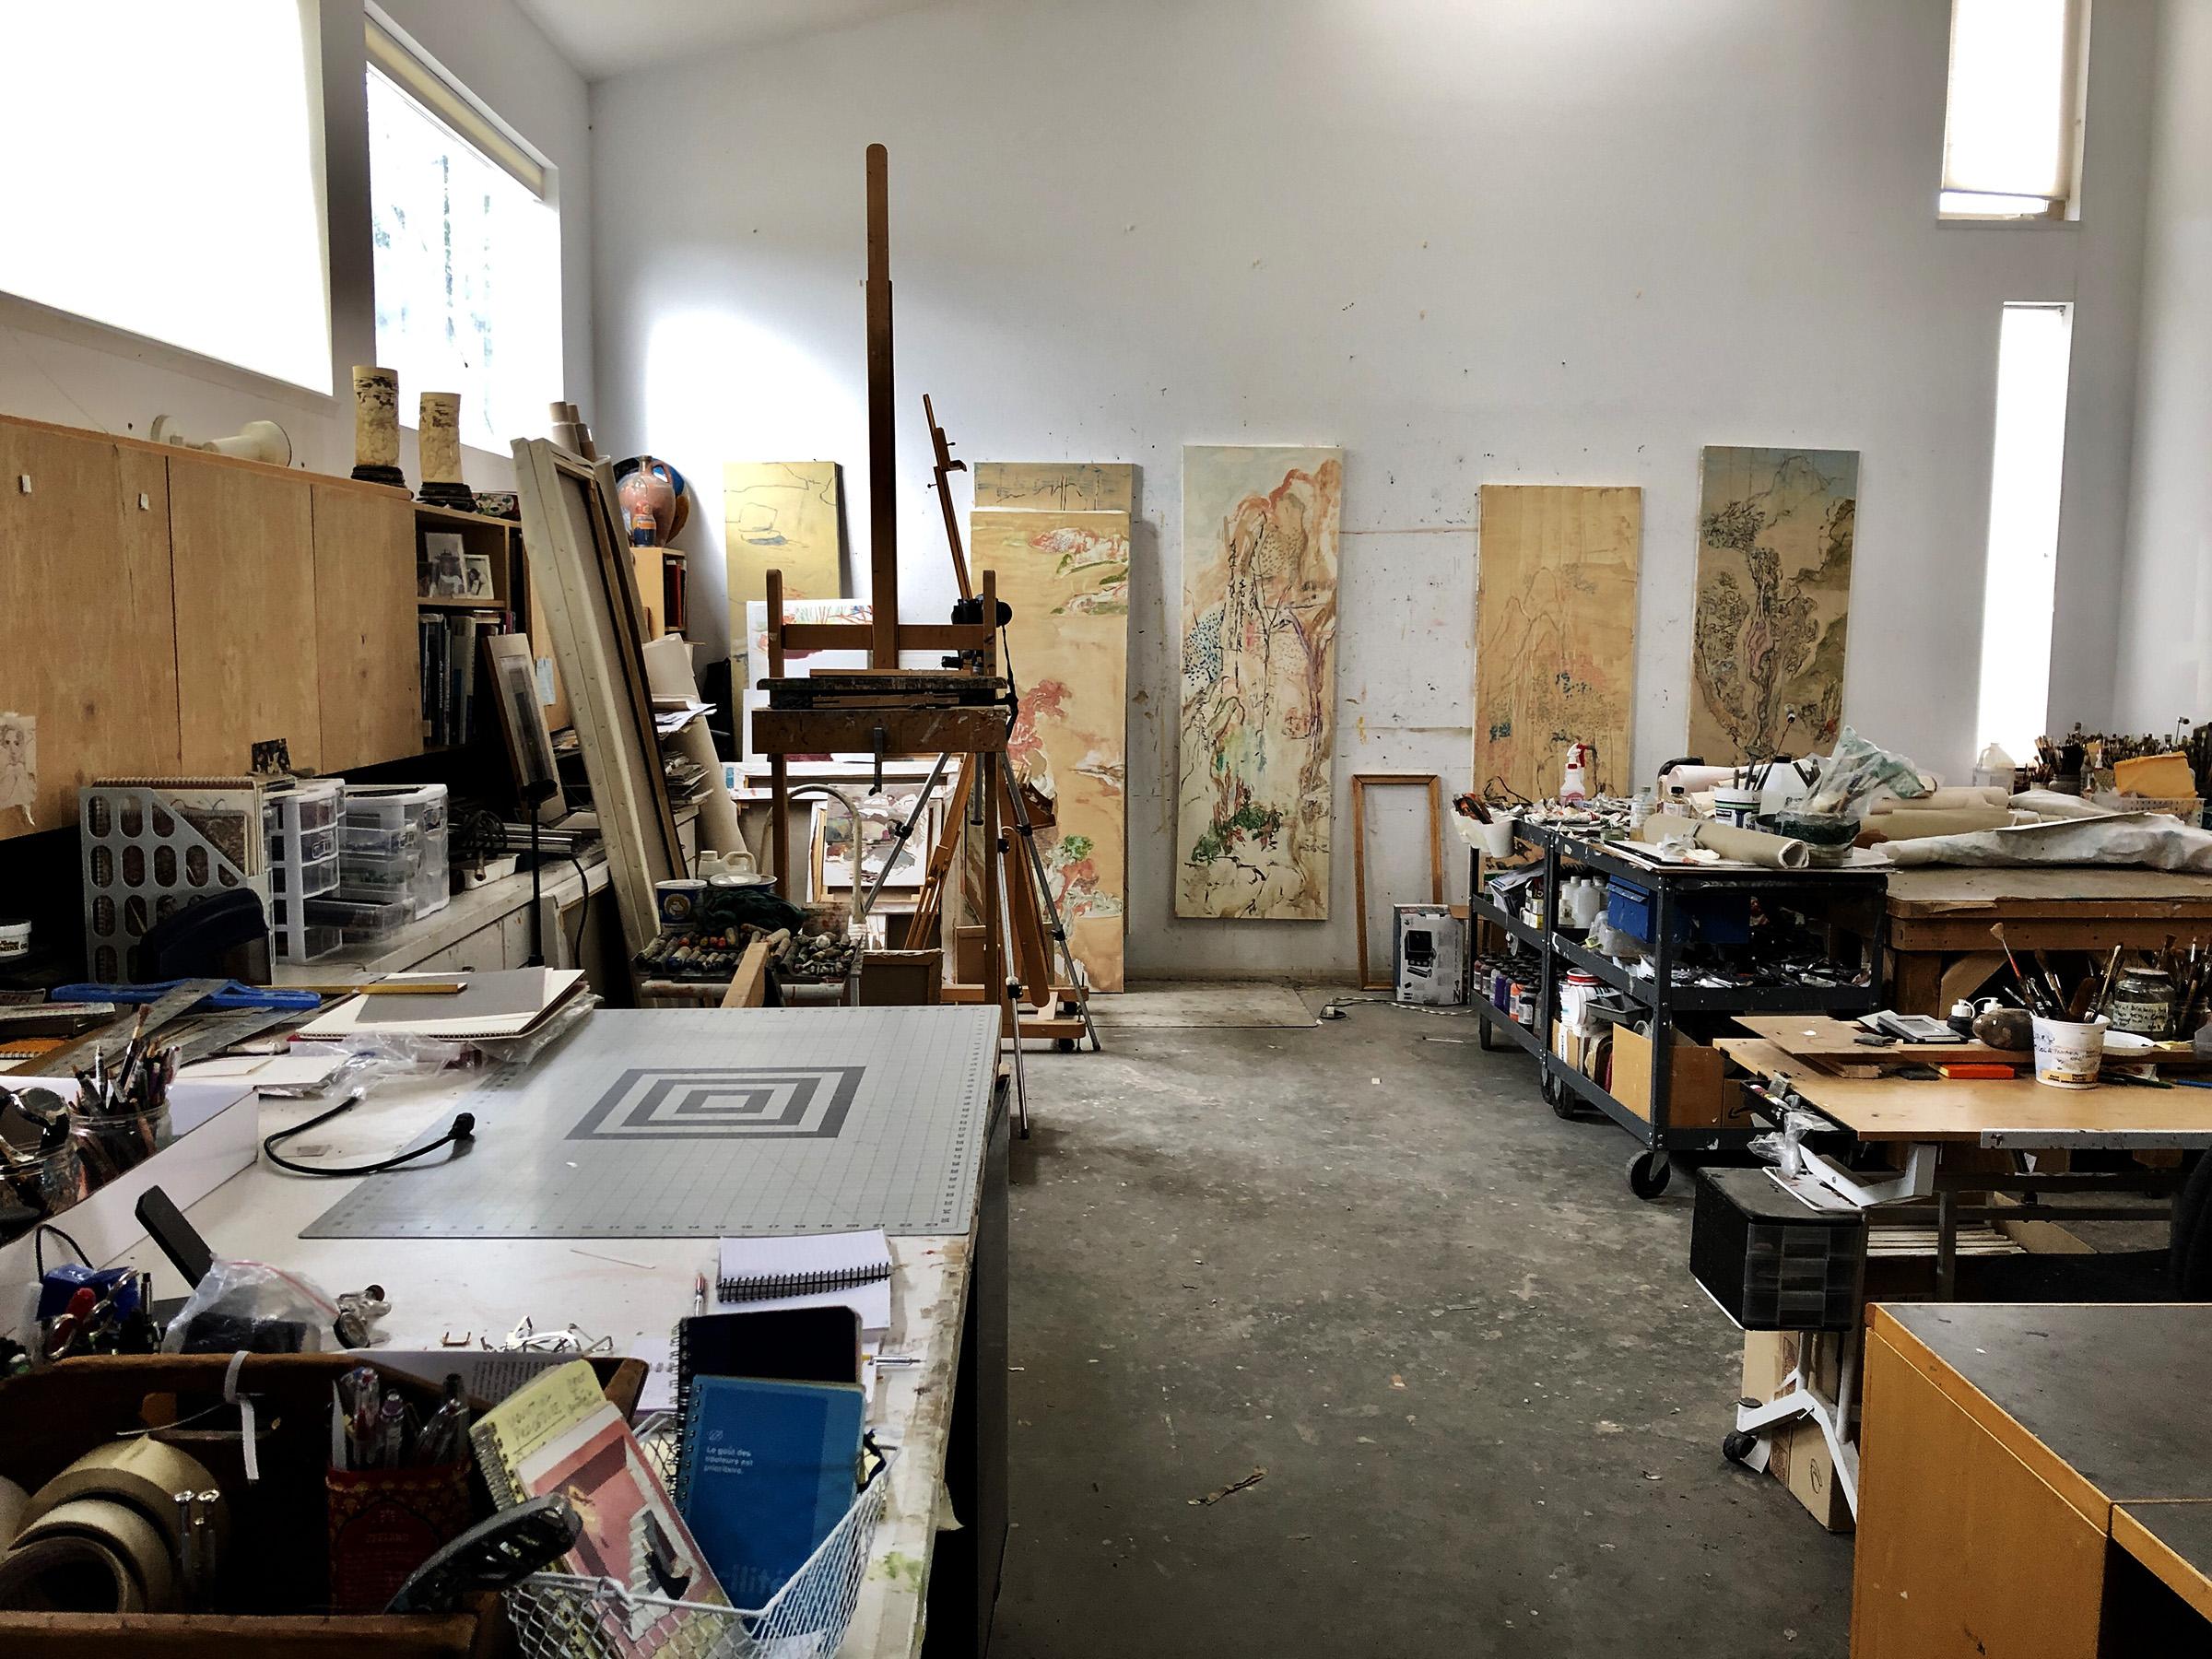 SITE-8-12-19 studio after cleanup.jpg